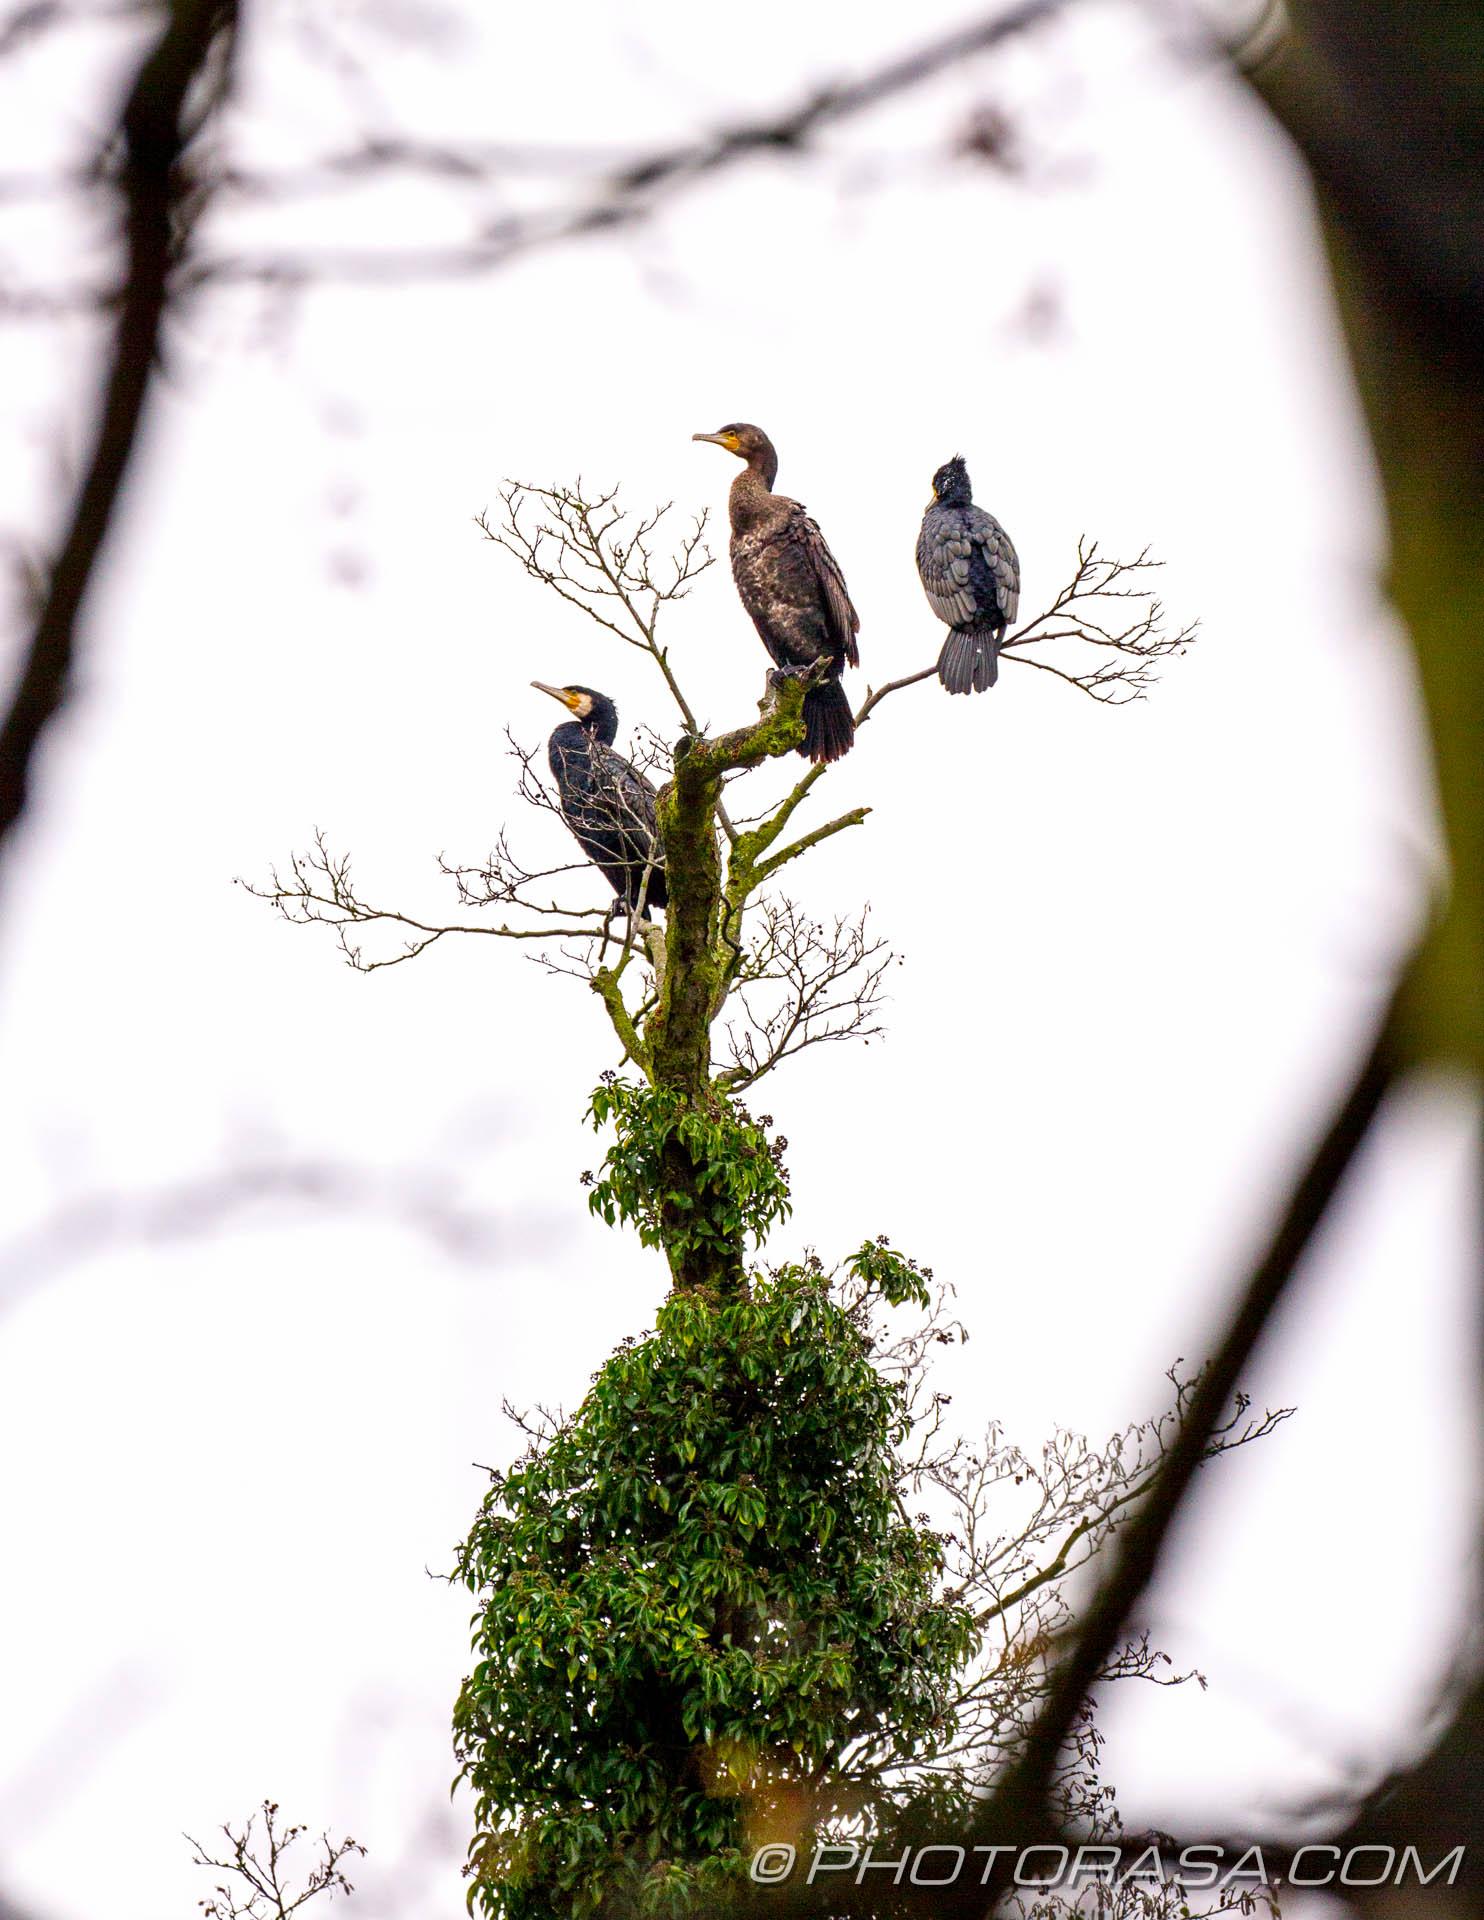 http://photorasa.com/three-cormorants/three-cormorants-2/